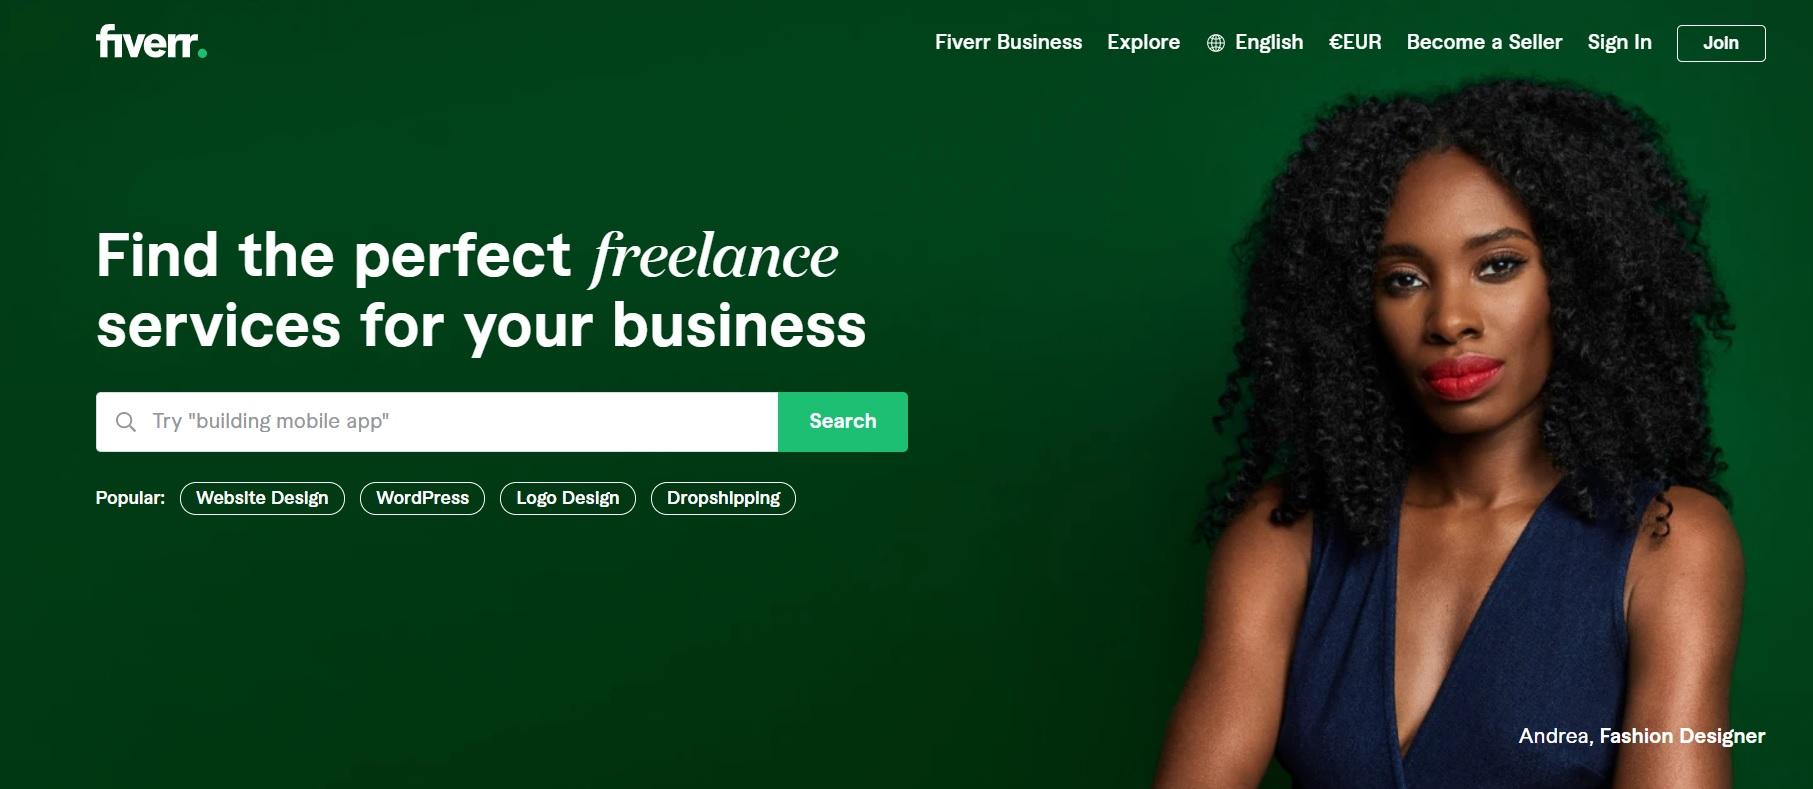 Fiverr homepage screenshot